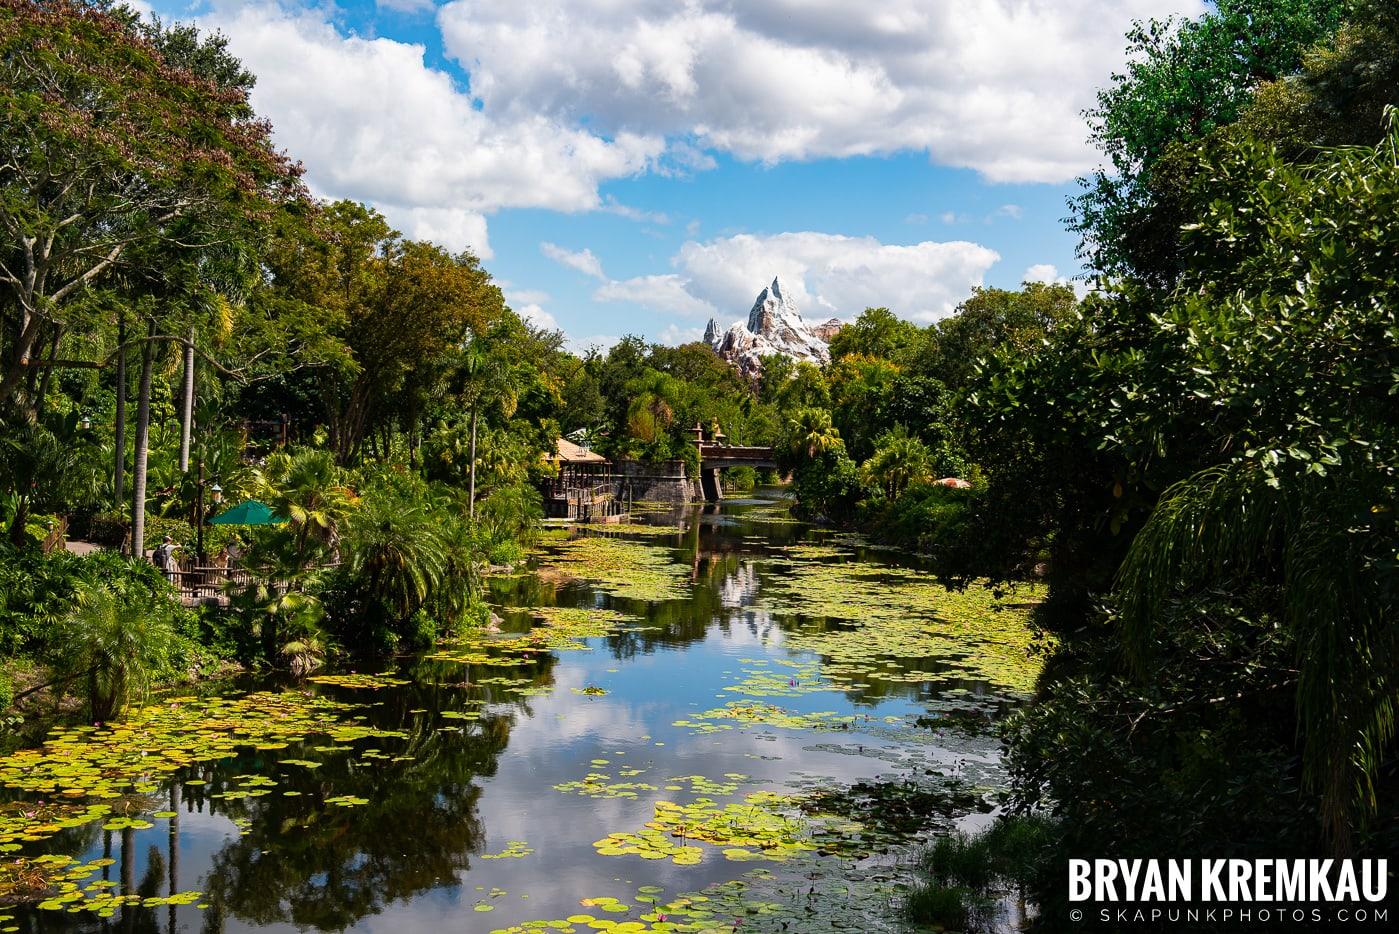 Walt Disney World Vacation: Day 5 (Animal Kingdom / Disney's Hollywood Studios) - 10.3.19 (53)